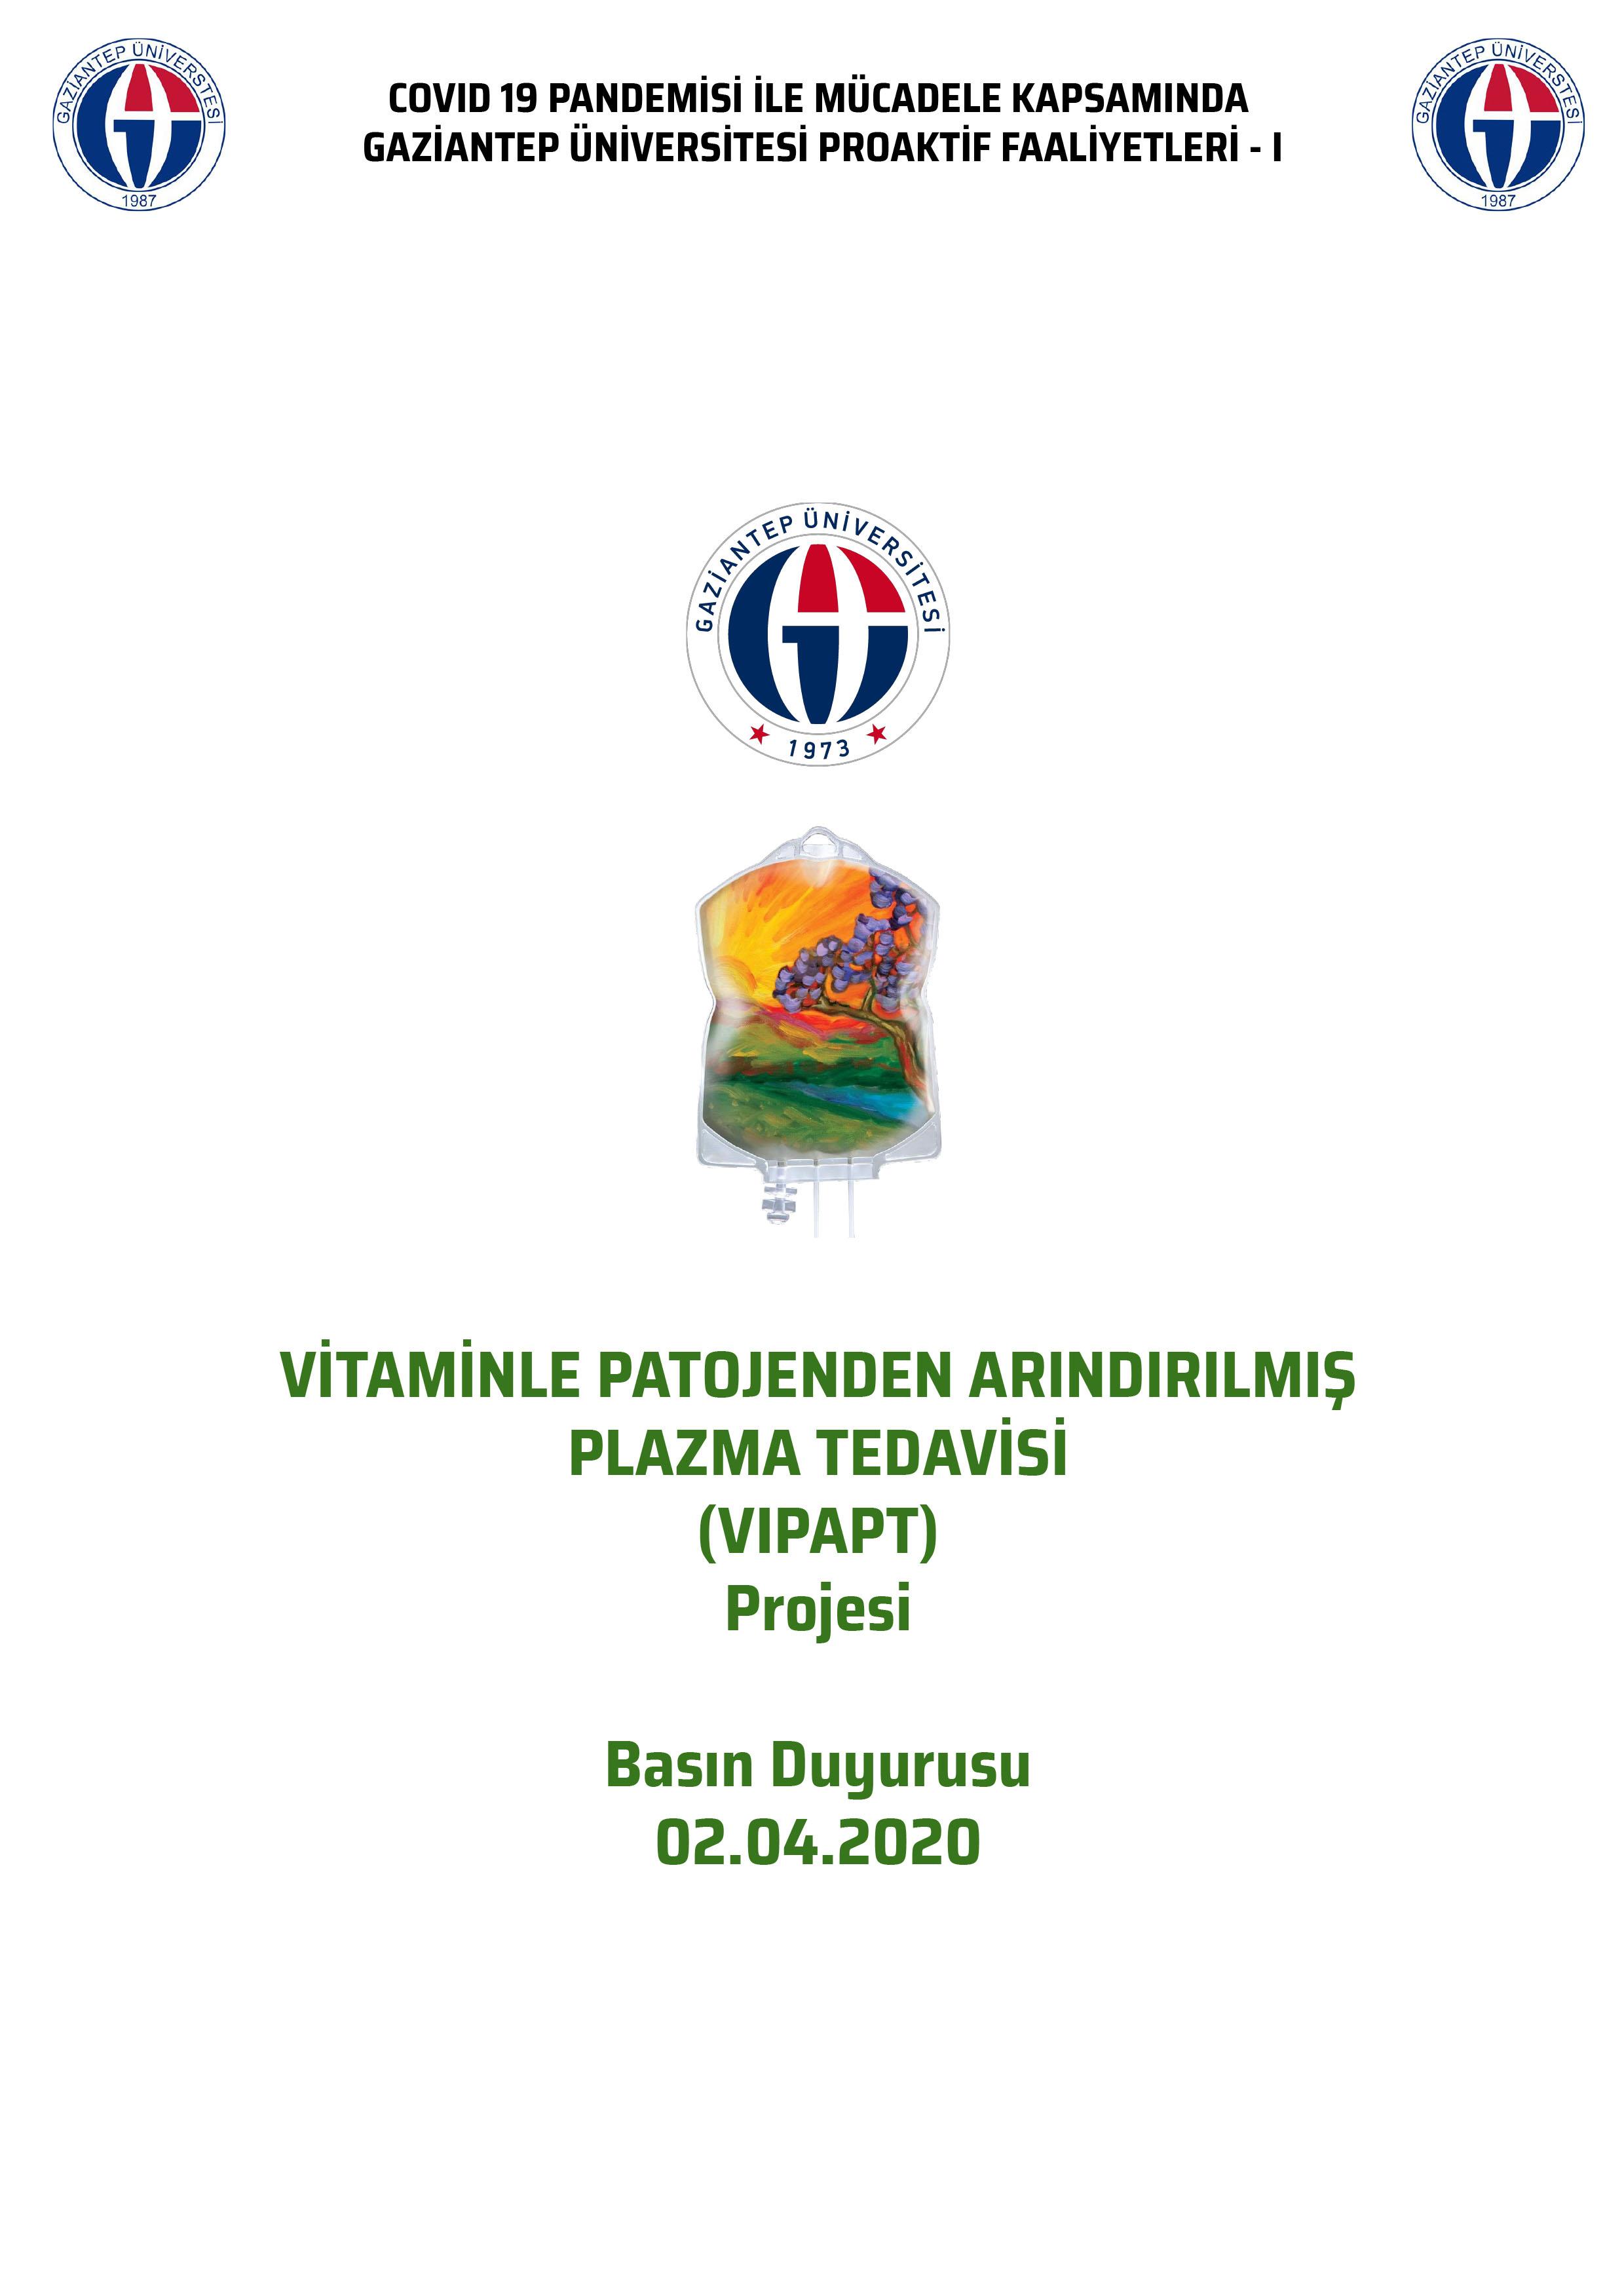 BASIN DUYURUSU 3.v.pdf.pdf.pdf-1